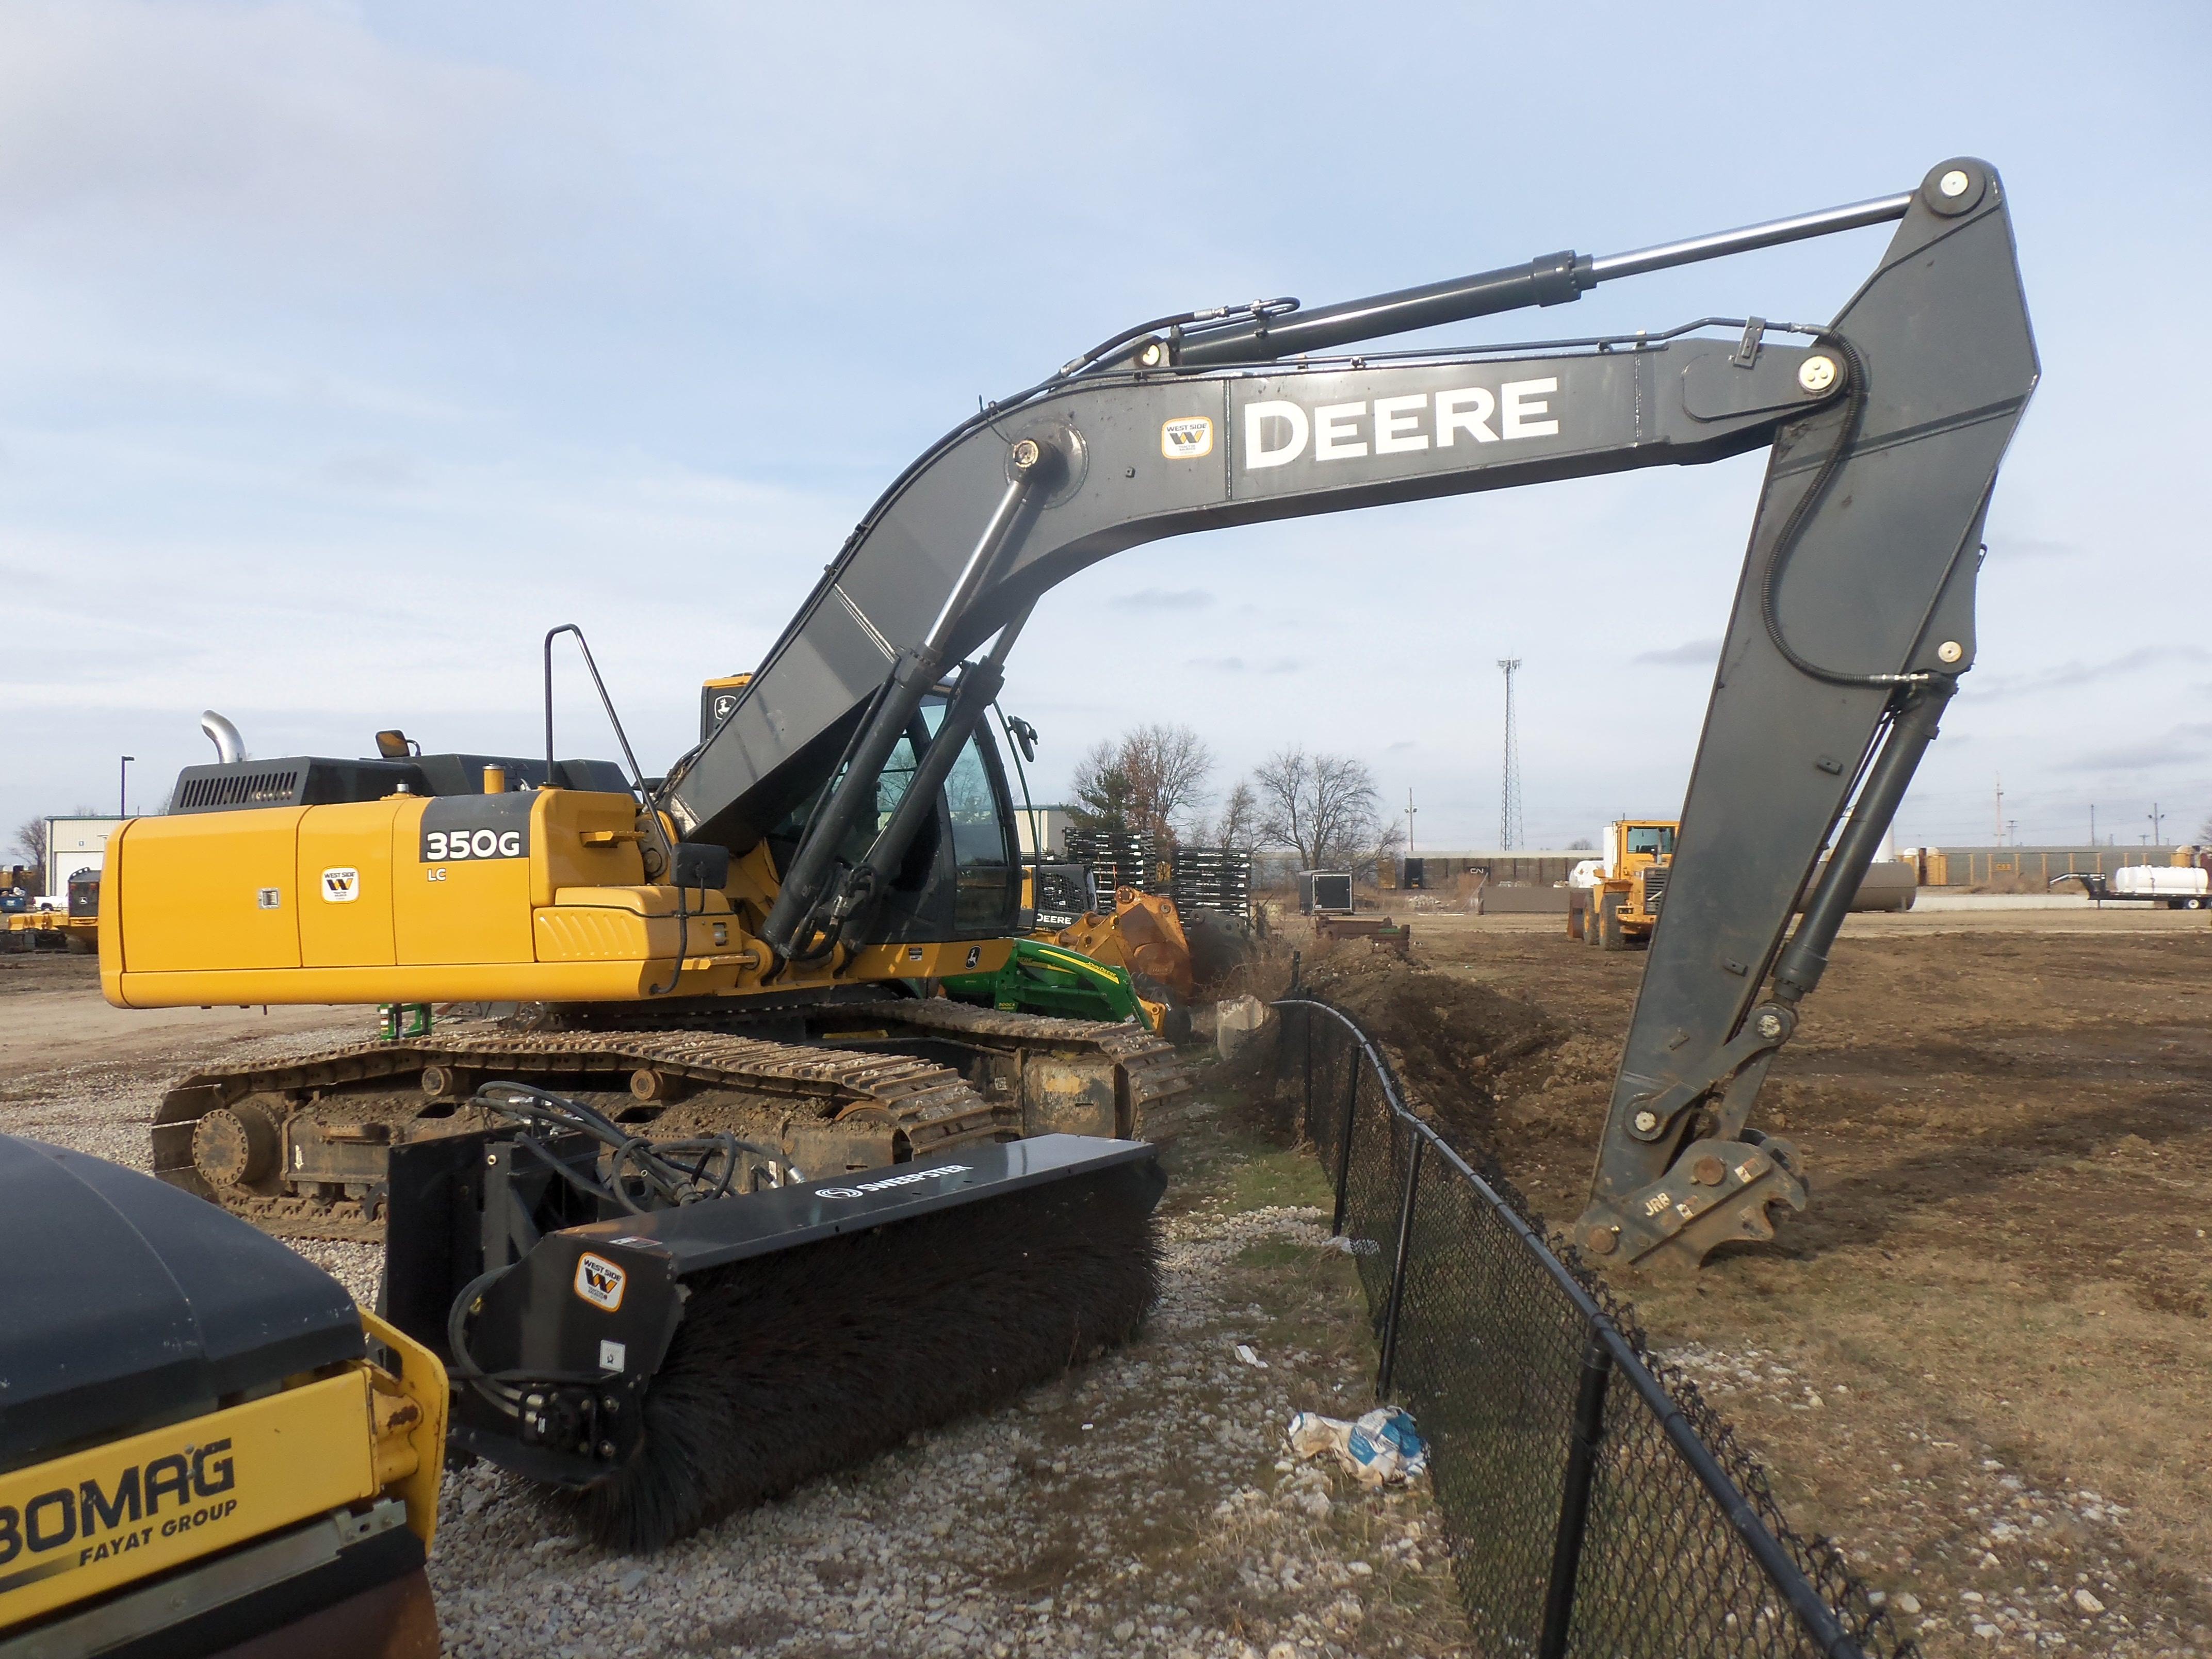 John Deere 350G LC excavator | John Deere equipment | Pinterest